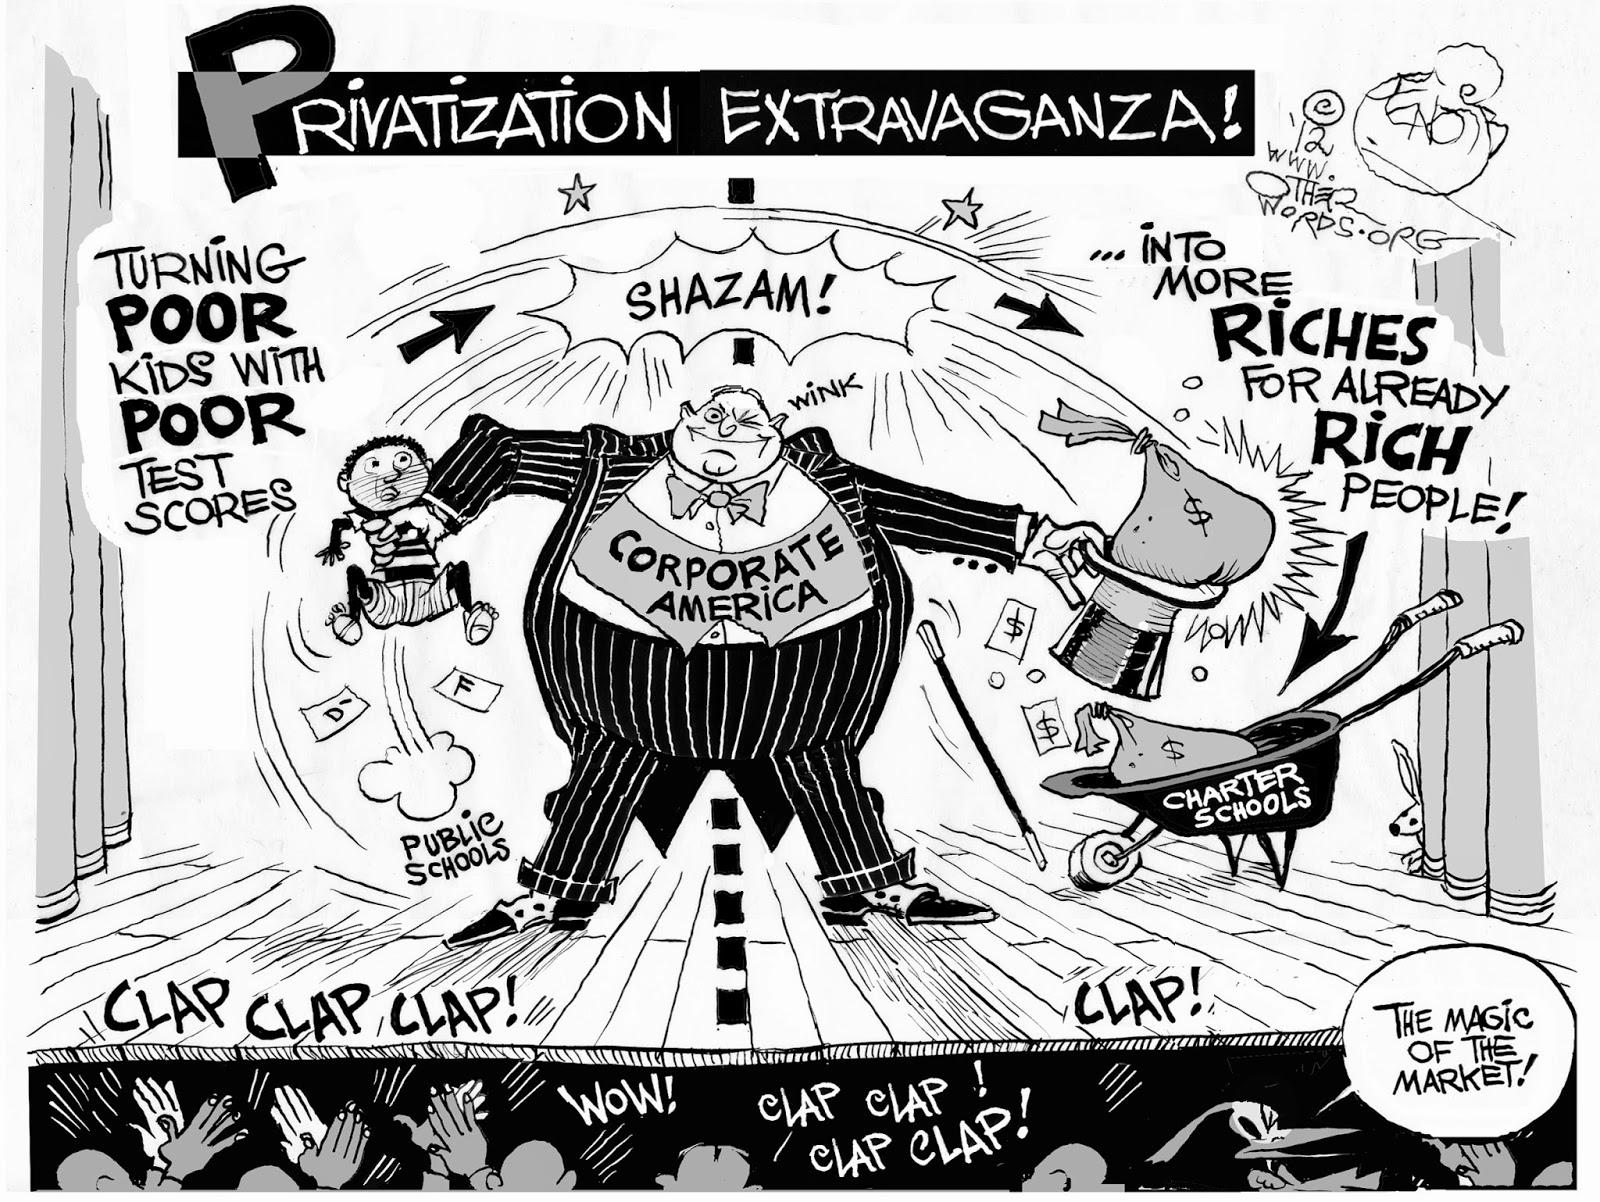 privatizing-public-schools-testing-not-h